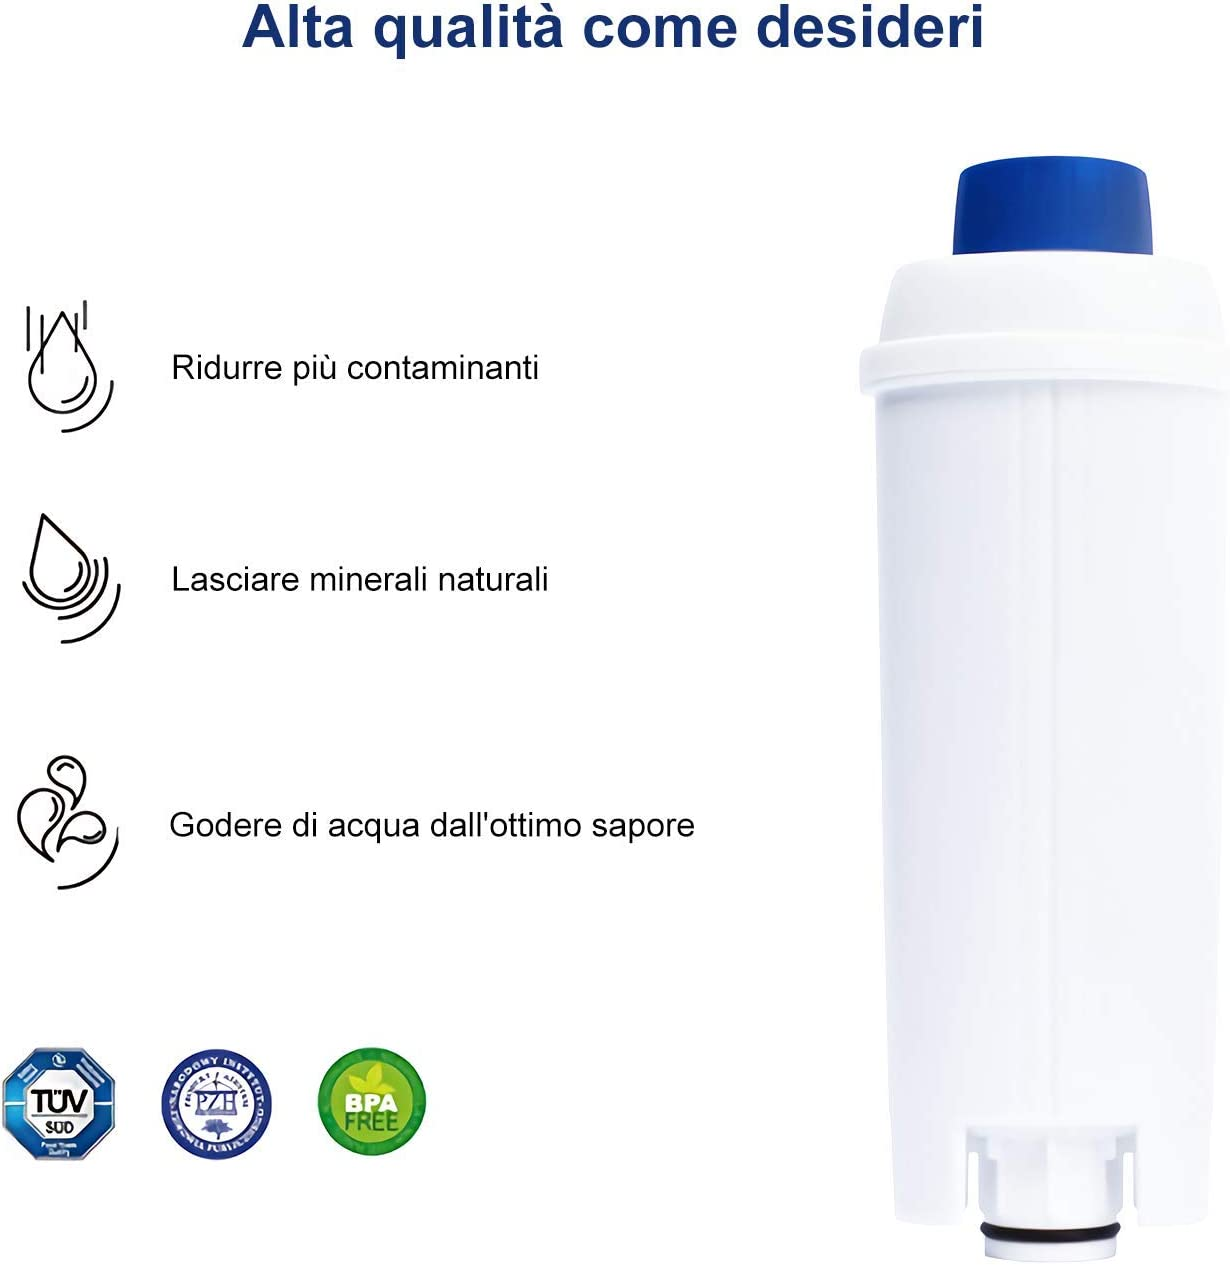 Filtro Acqua per Macchina da Caff/è Filtro Adatto a ECAM BCO EC MUHOO 2 Pezzi Filtri Addolcitore per Macchina da Caff/è Delonghi DLSC002 ETAM Addolcitore Cartucce a Carbone Attivo Esam